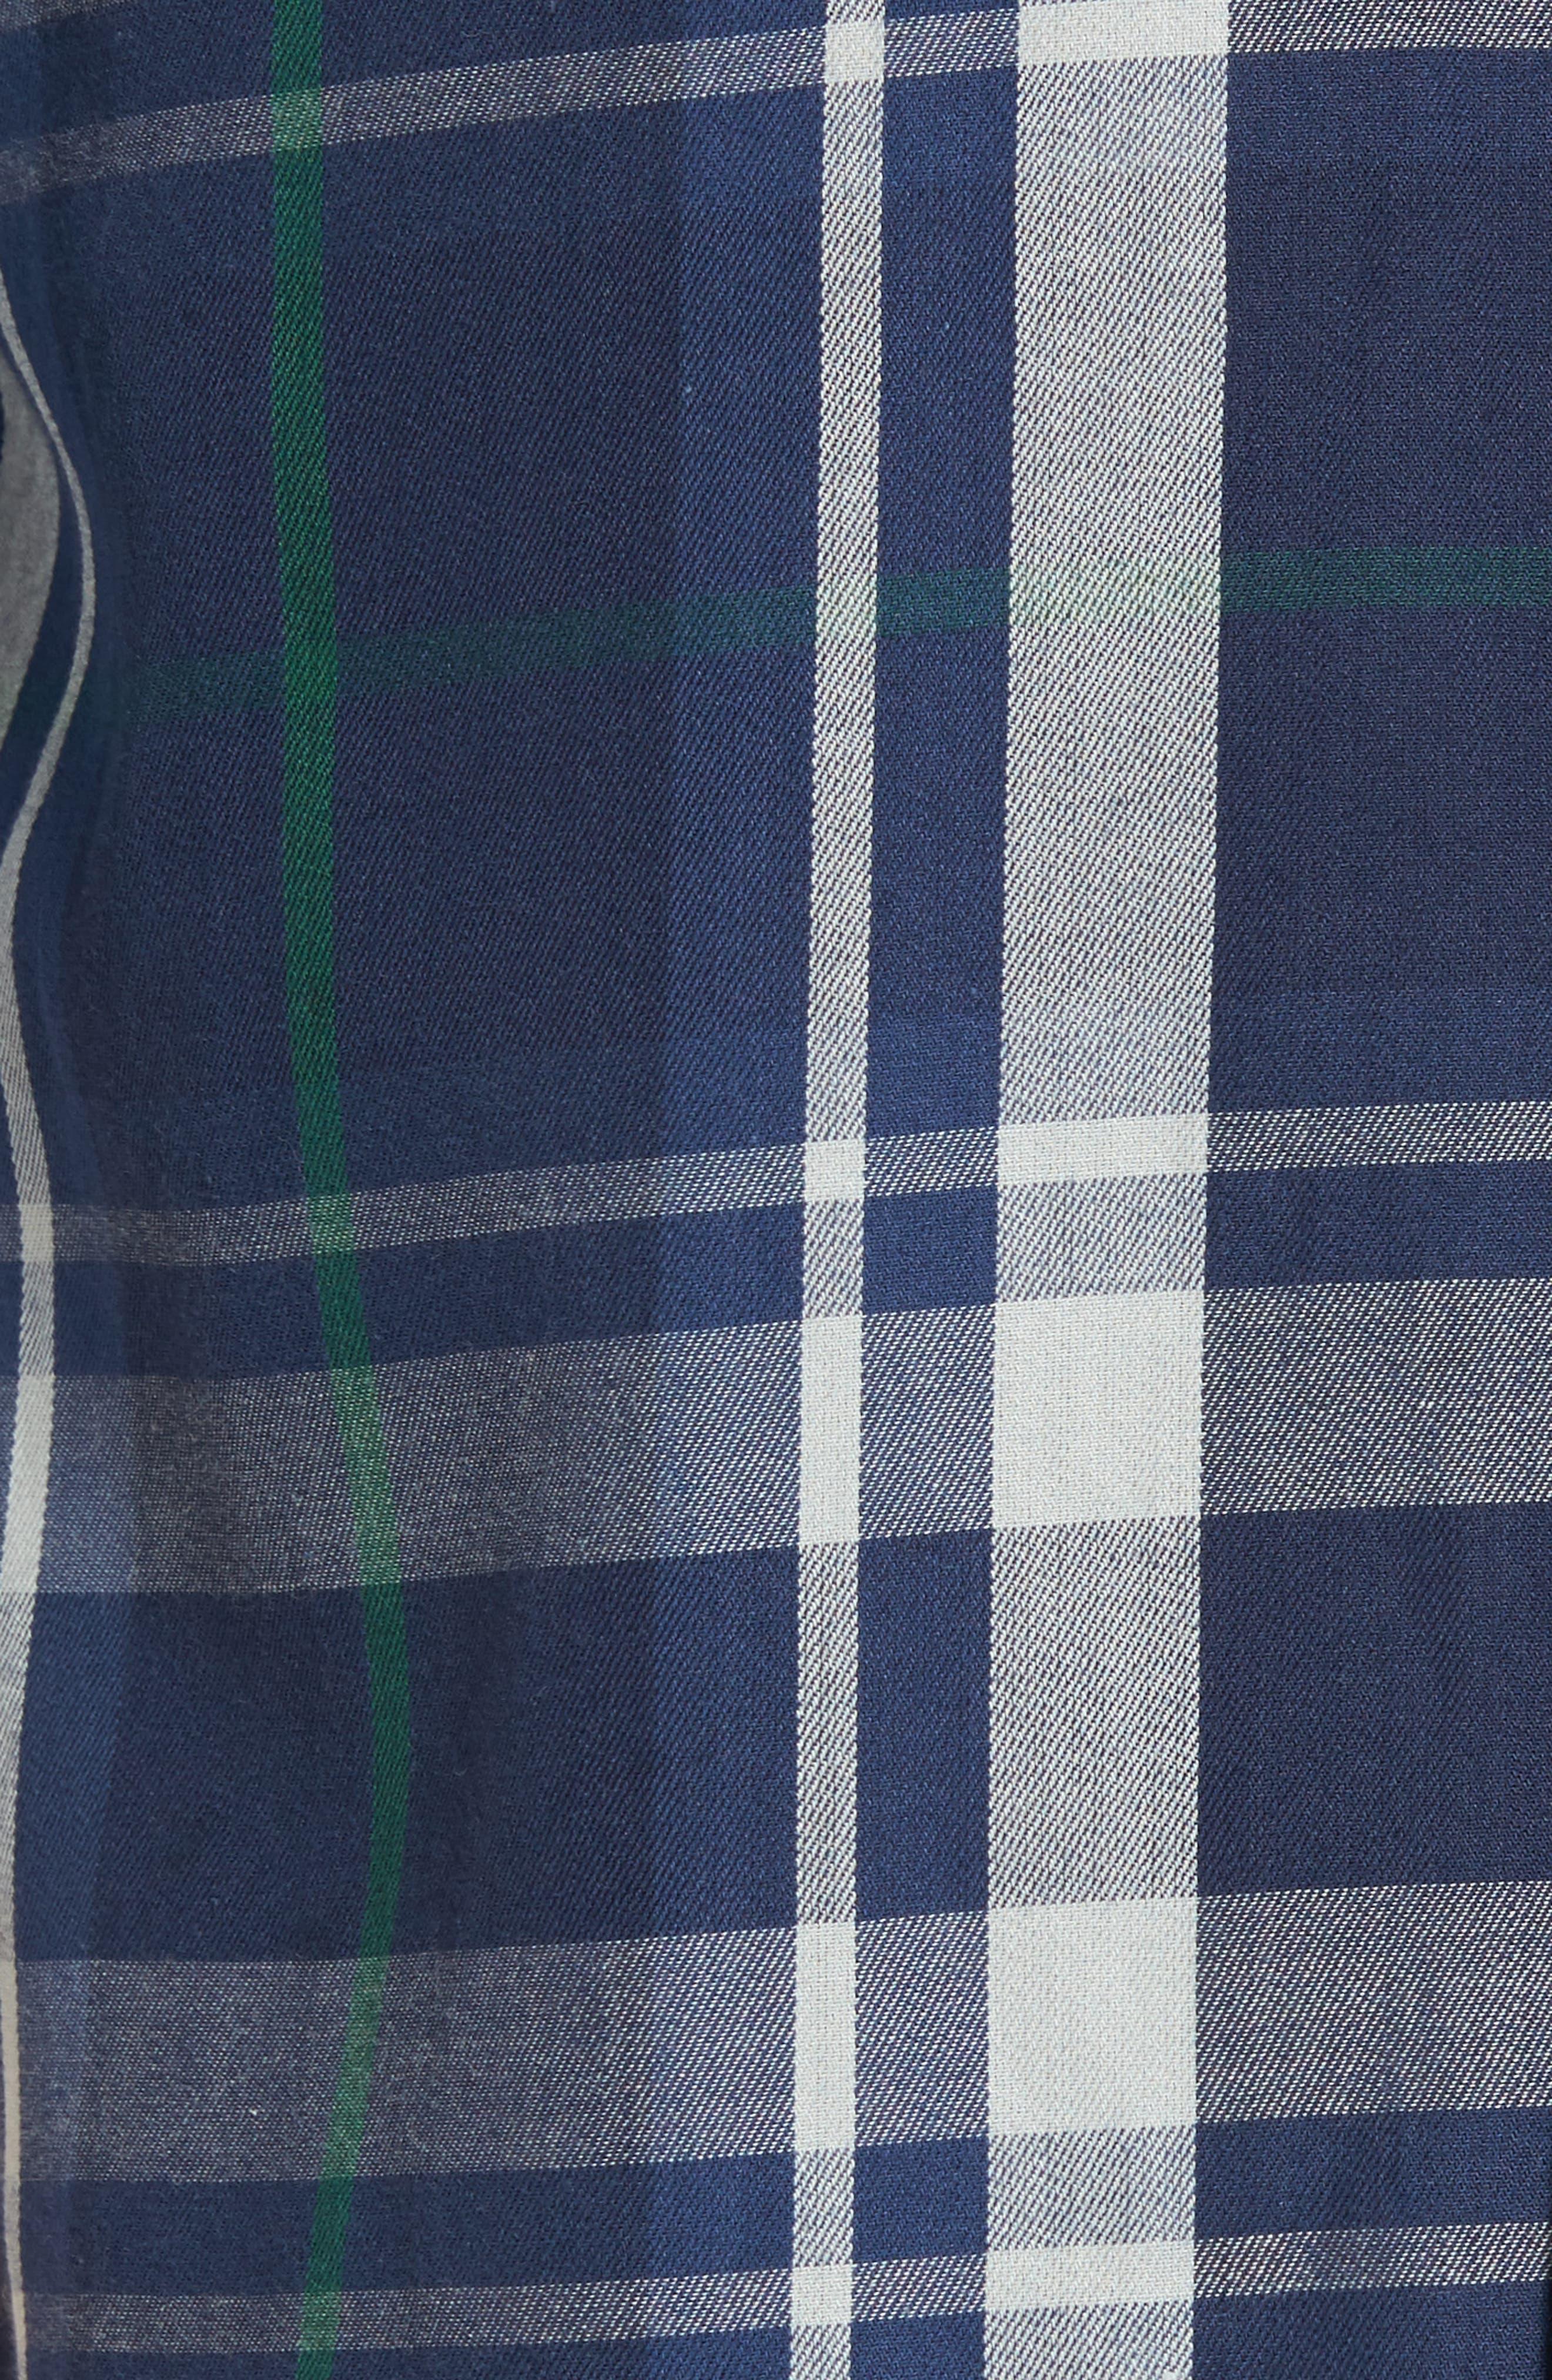 Waas 2 Plaid Woven Shirt,                             Alternate thumbnail 10, color,